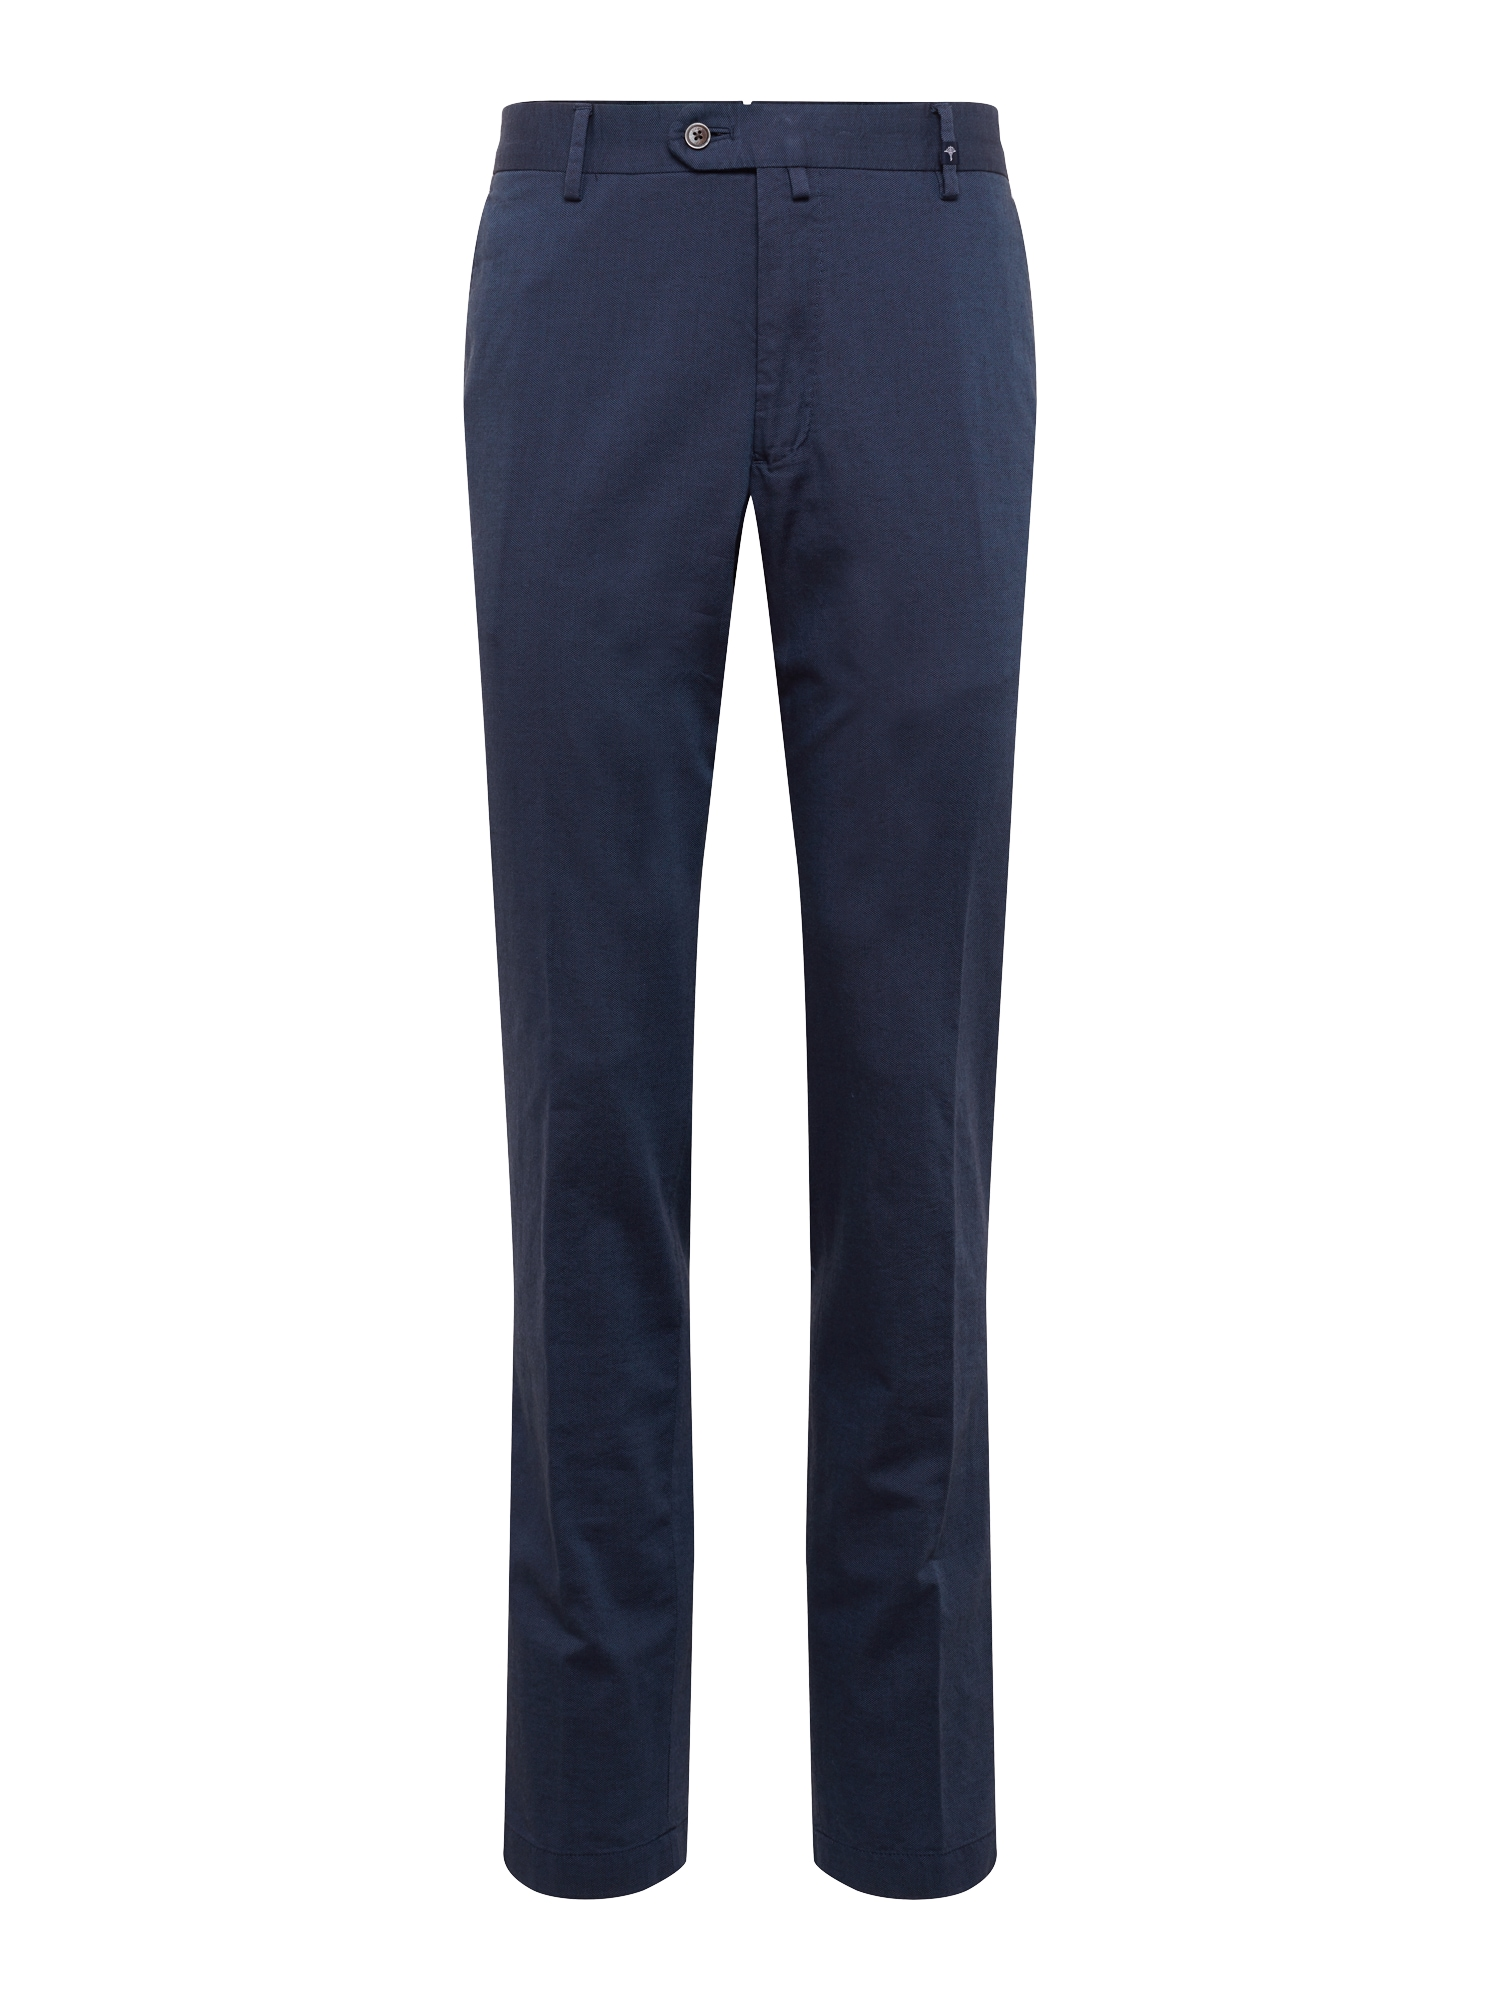 Kalhoty 17 JT-24Hanc-W 10007149 tmavě modrá JOOP!